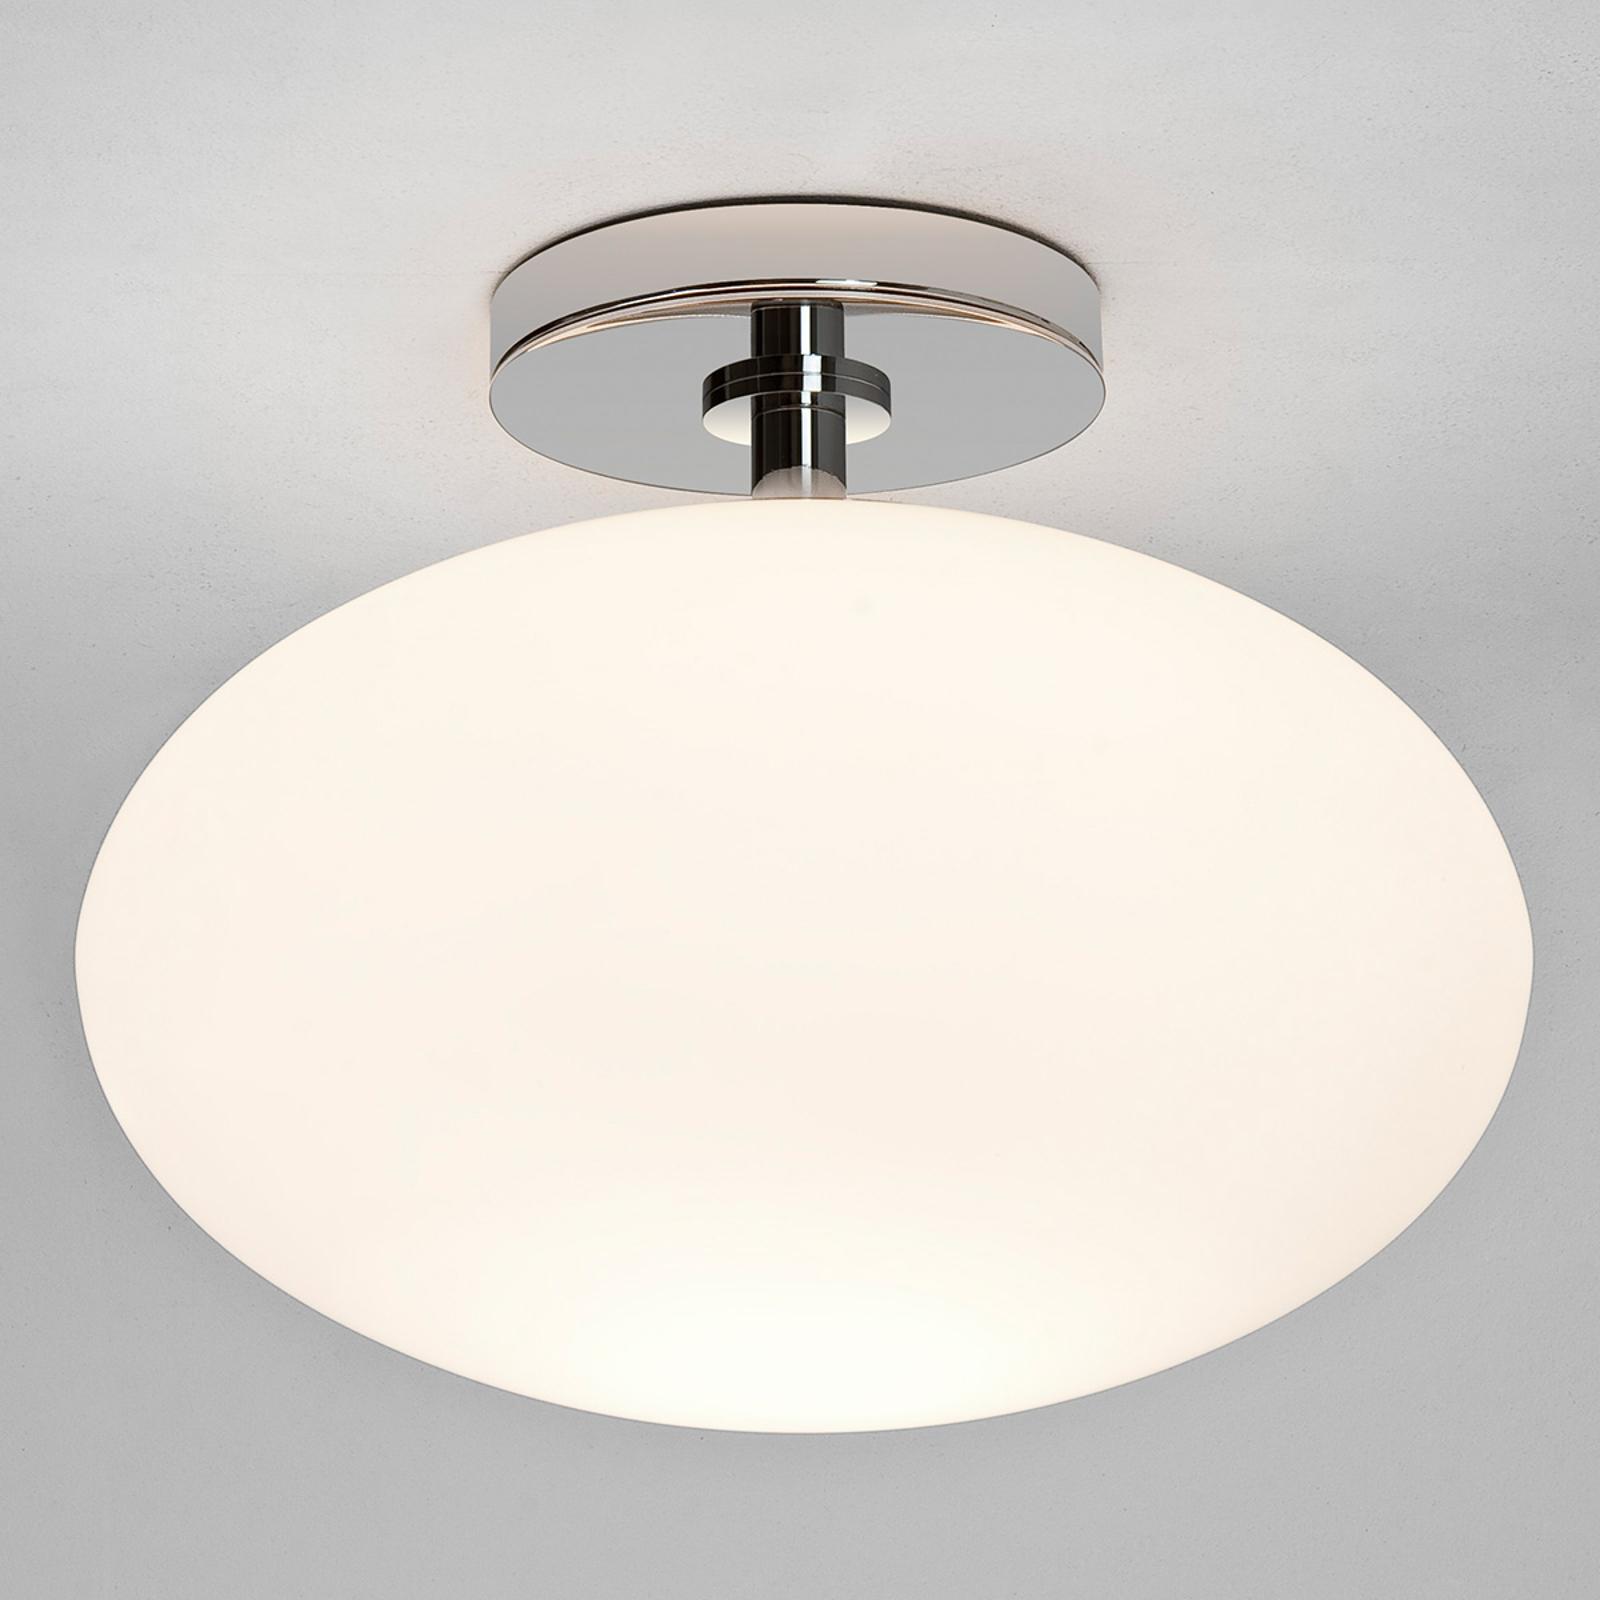 Ovale bad-plafondlamp Zeppo